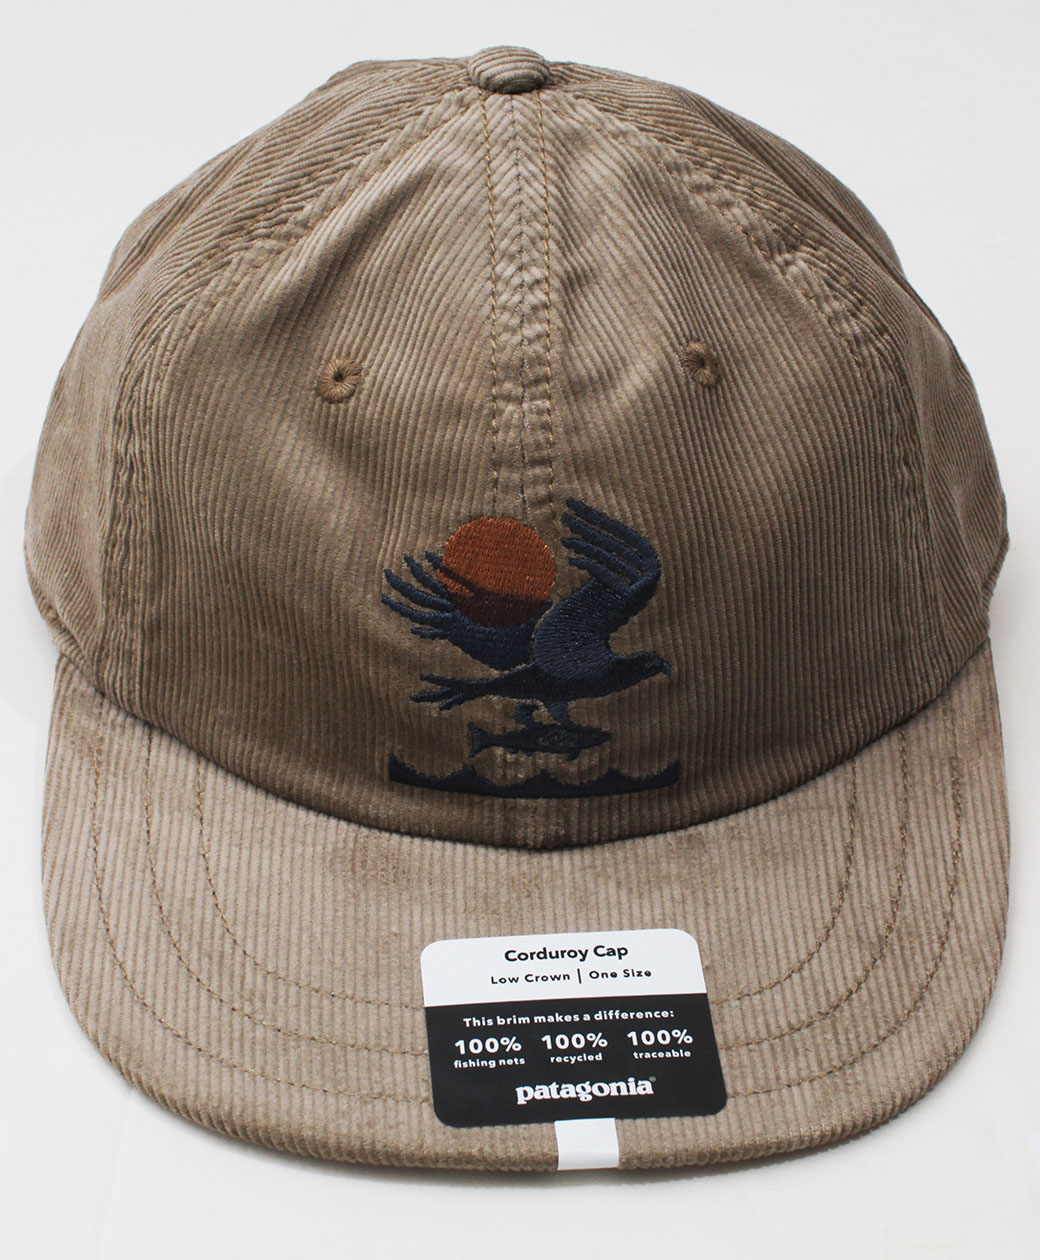 patagonia CORDUROY  CAP(Original Angler Mojave Khaki)